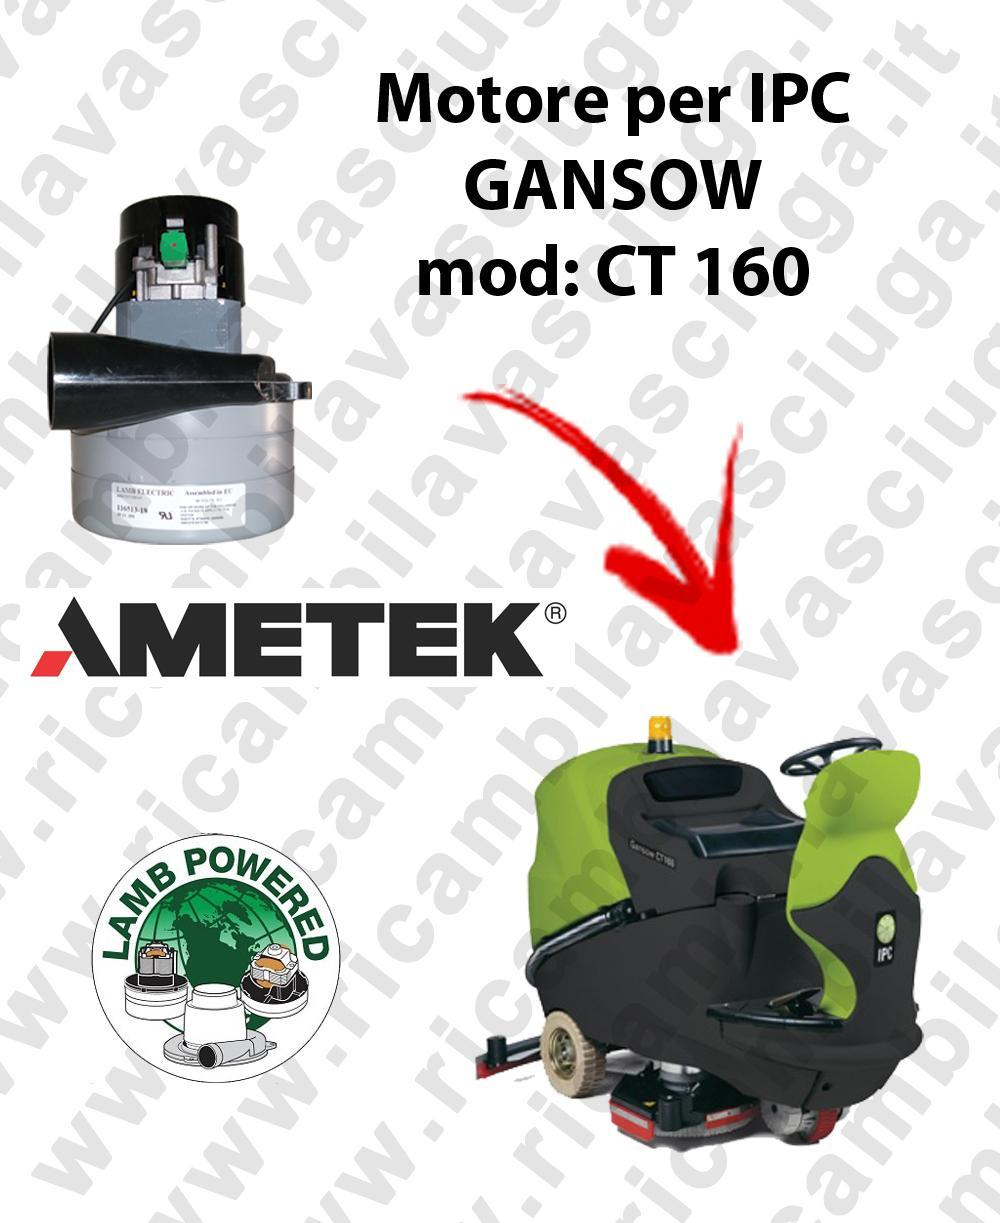 CT 160 LAMB AMETEK vacuum motor for scrubber dryer IPC GANSOW